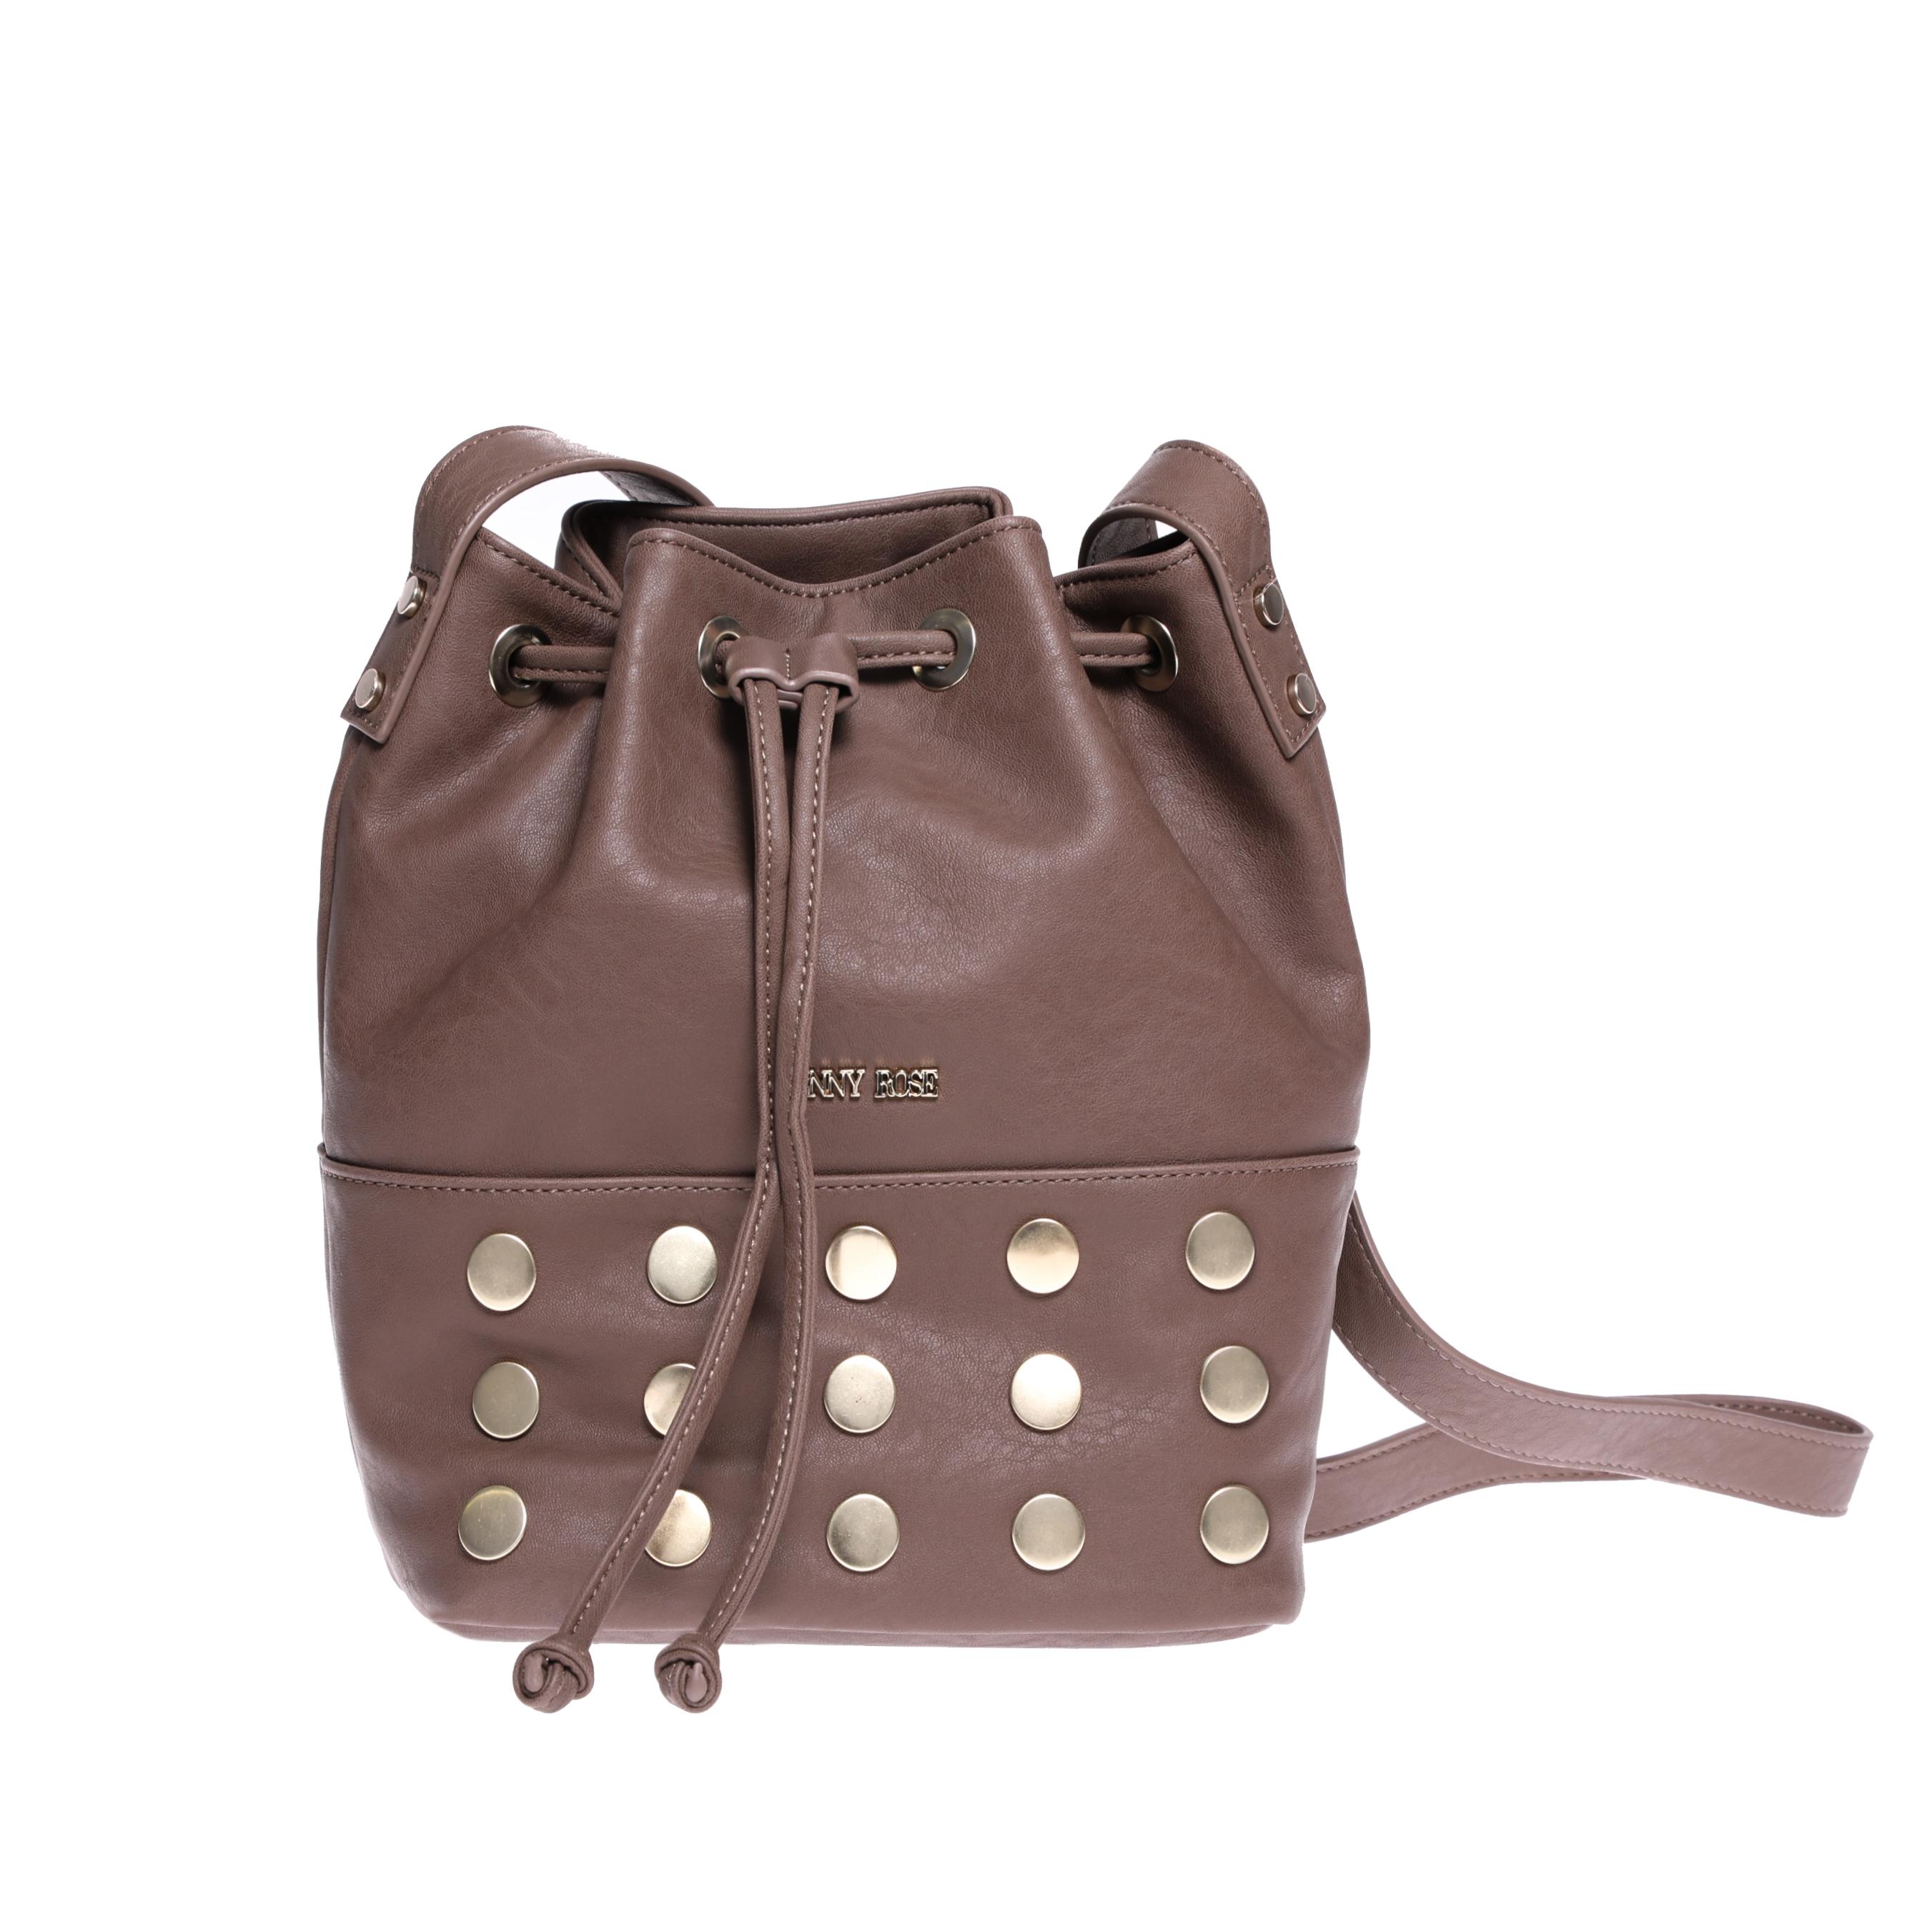 DENNY ROSE – Γυναικεία τσάντα Denny Rose καφέ 1596979.0-K400